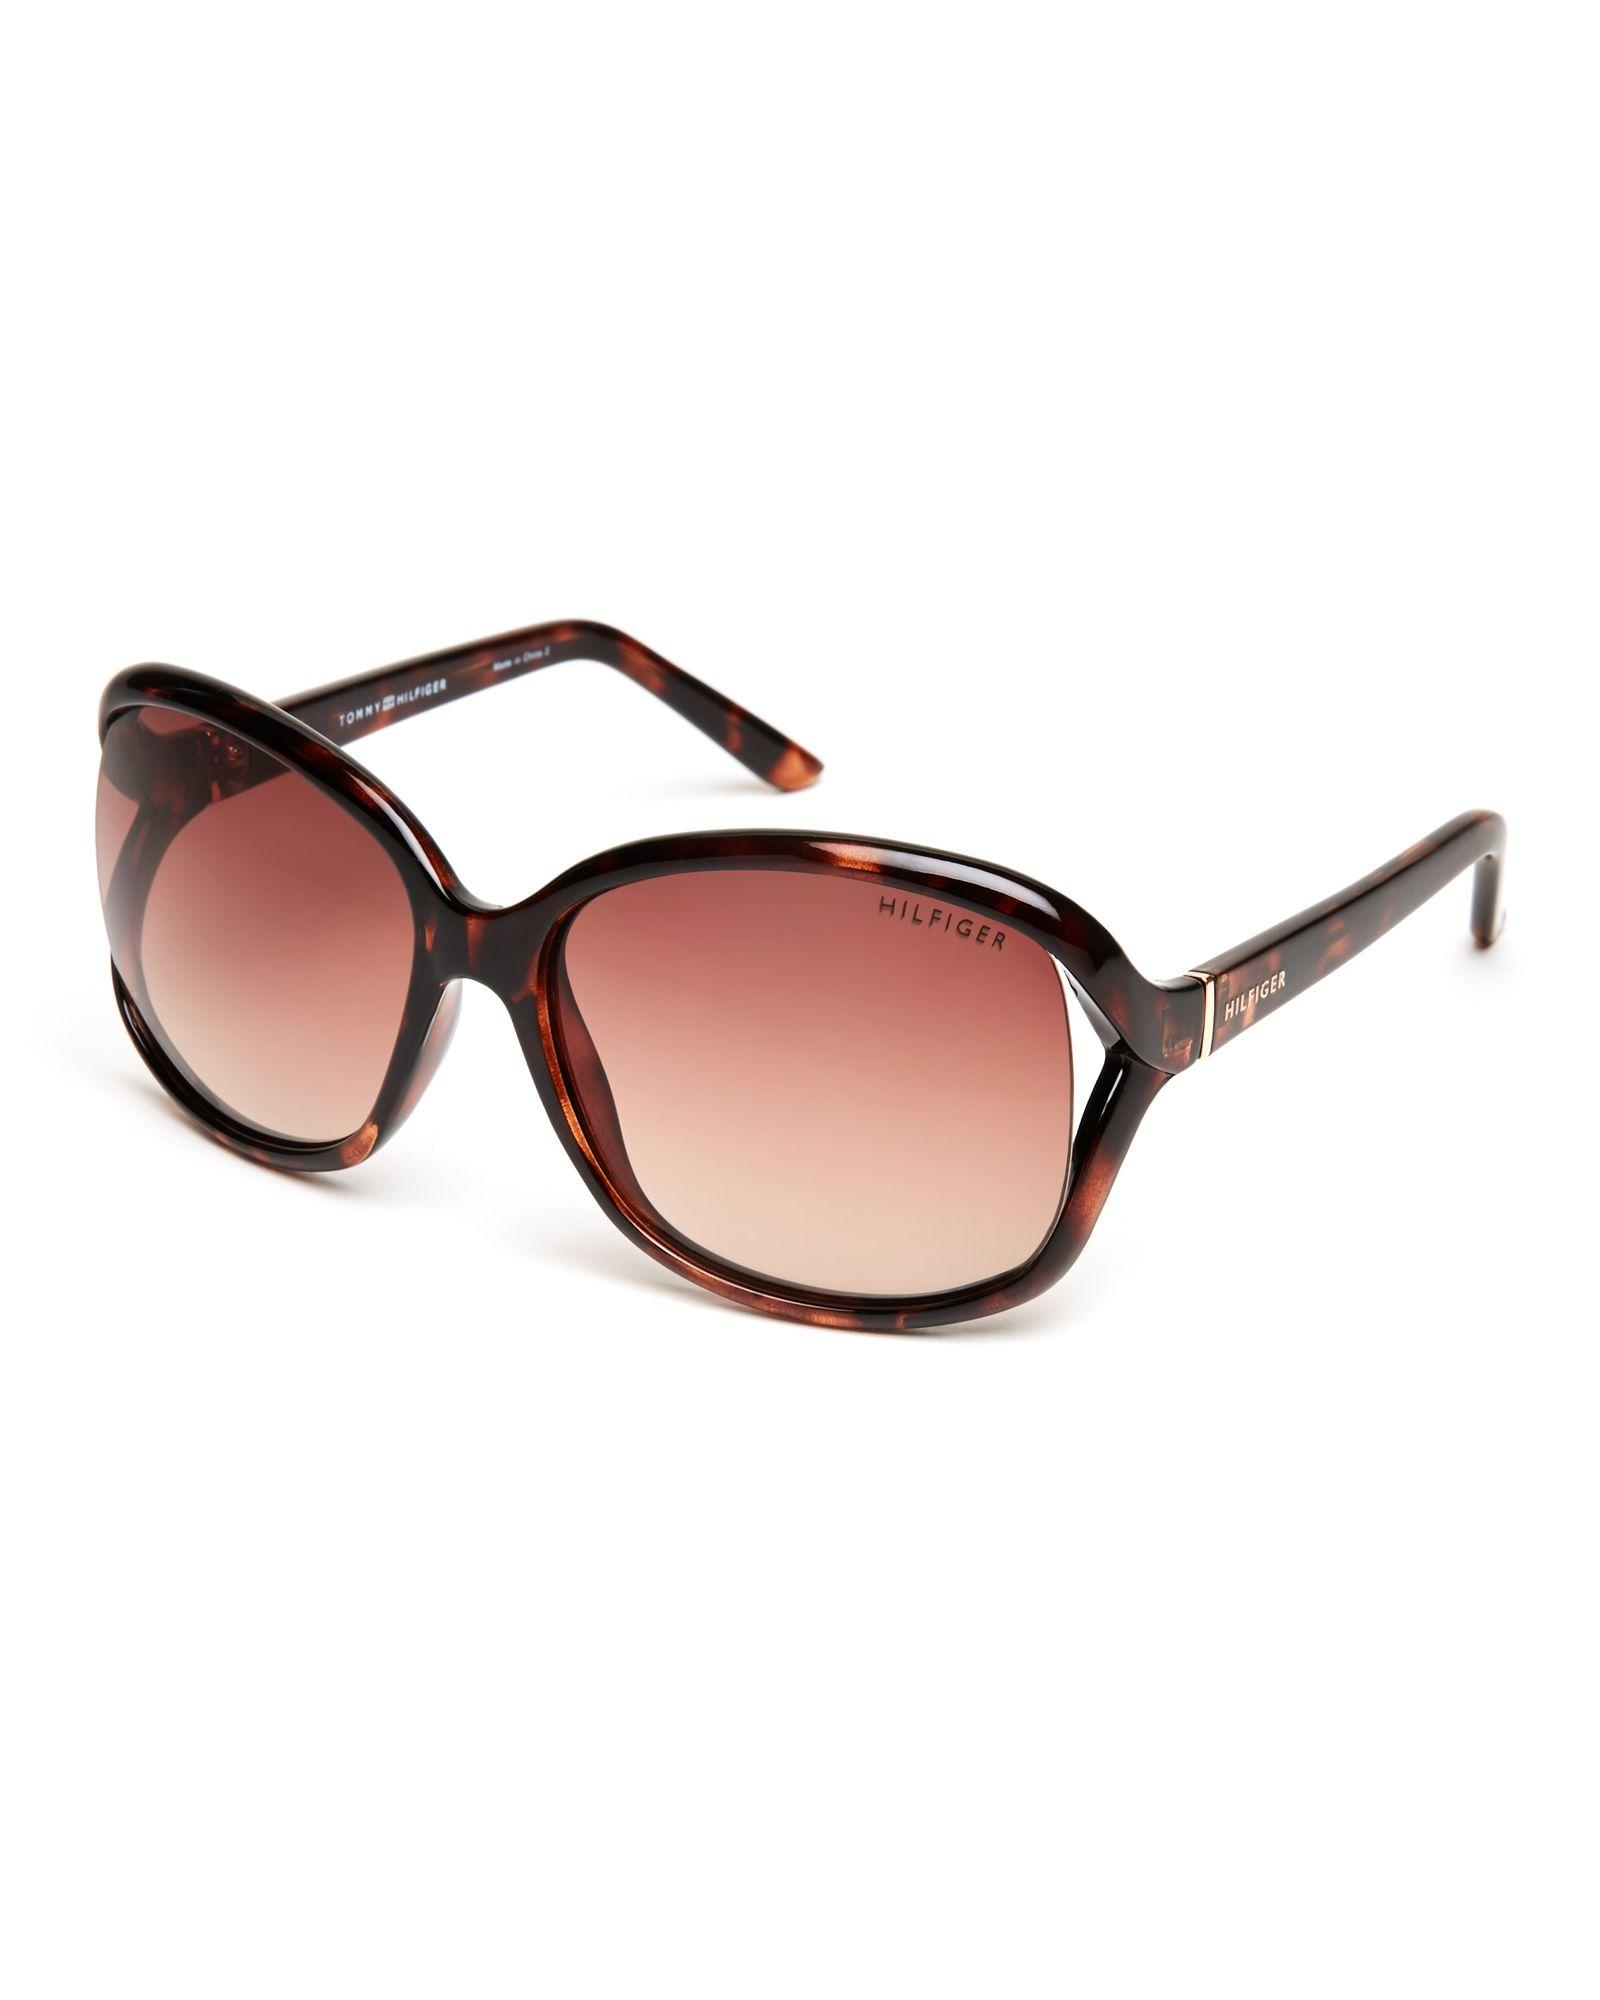 Tommy Hilfiger Tortoiseshell-Look Jade-WP XL Square Sunglasses